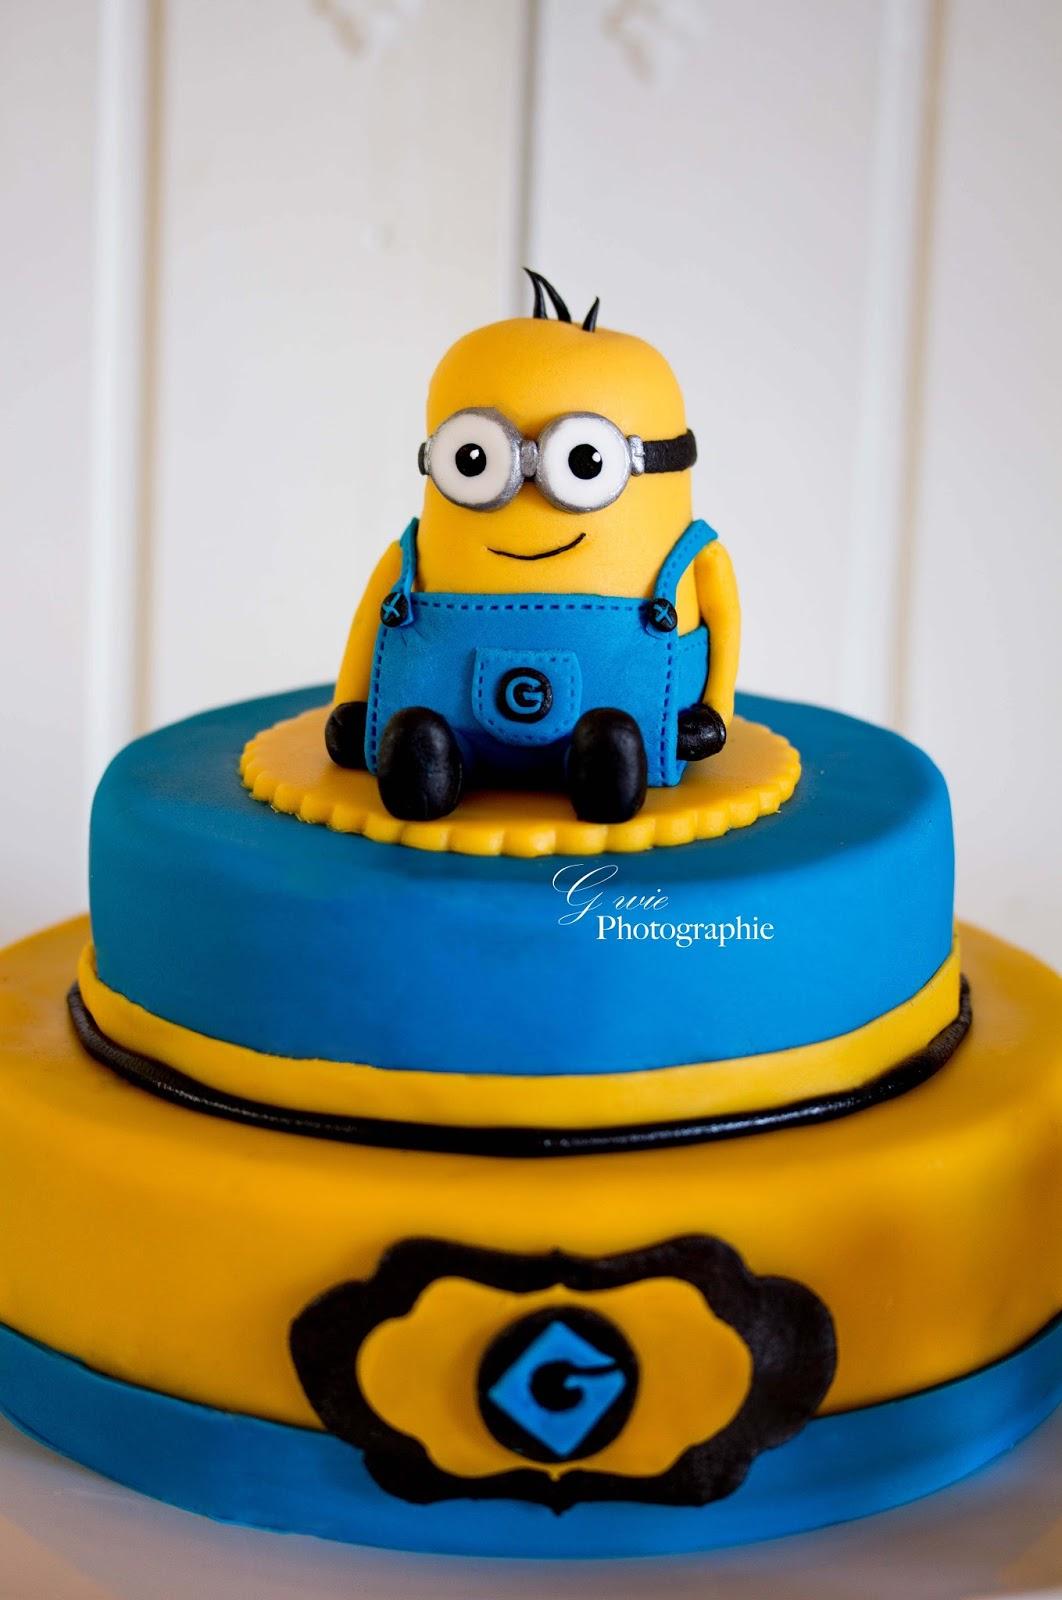 G Wie 5 Geburtstag Glenn Minions Sweet Table